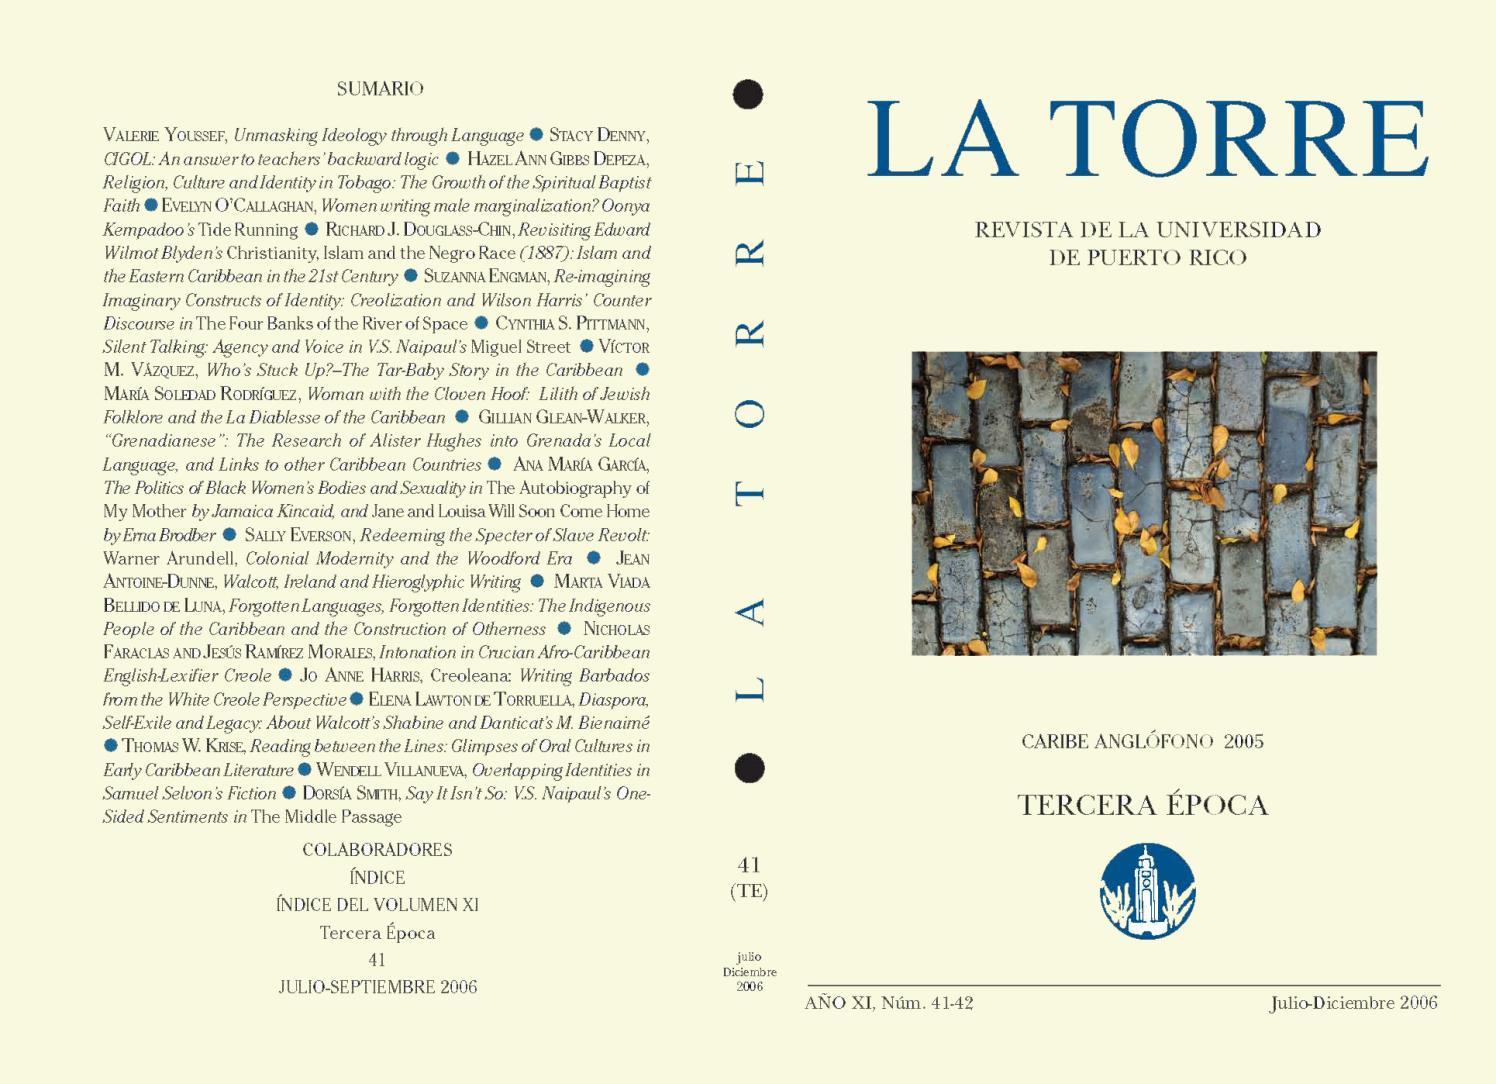 La Torre 2006 julio-diciembre (Caribe Anglófono 2005) by La